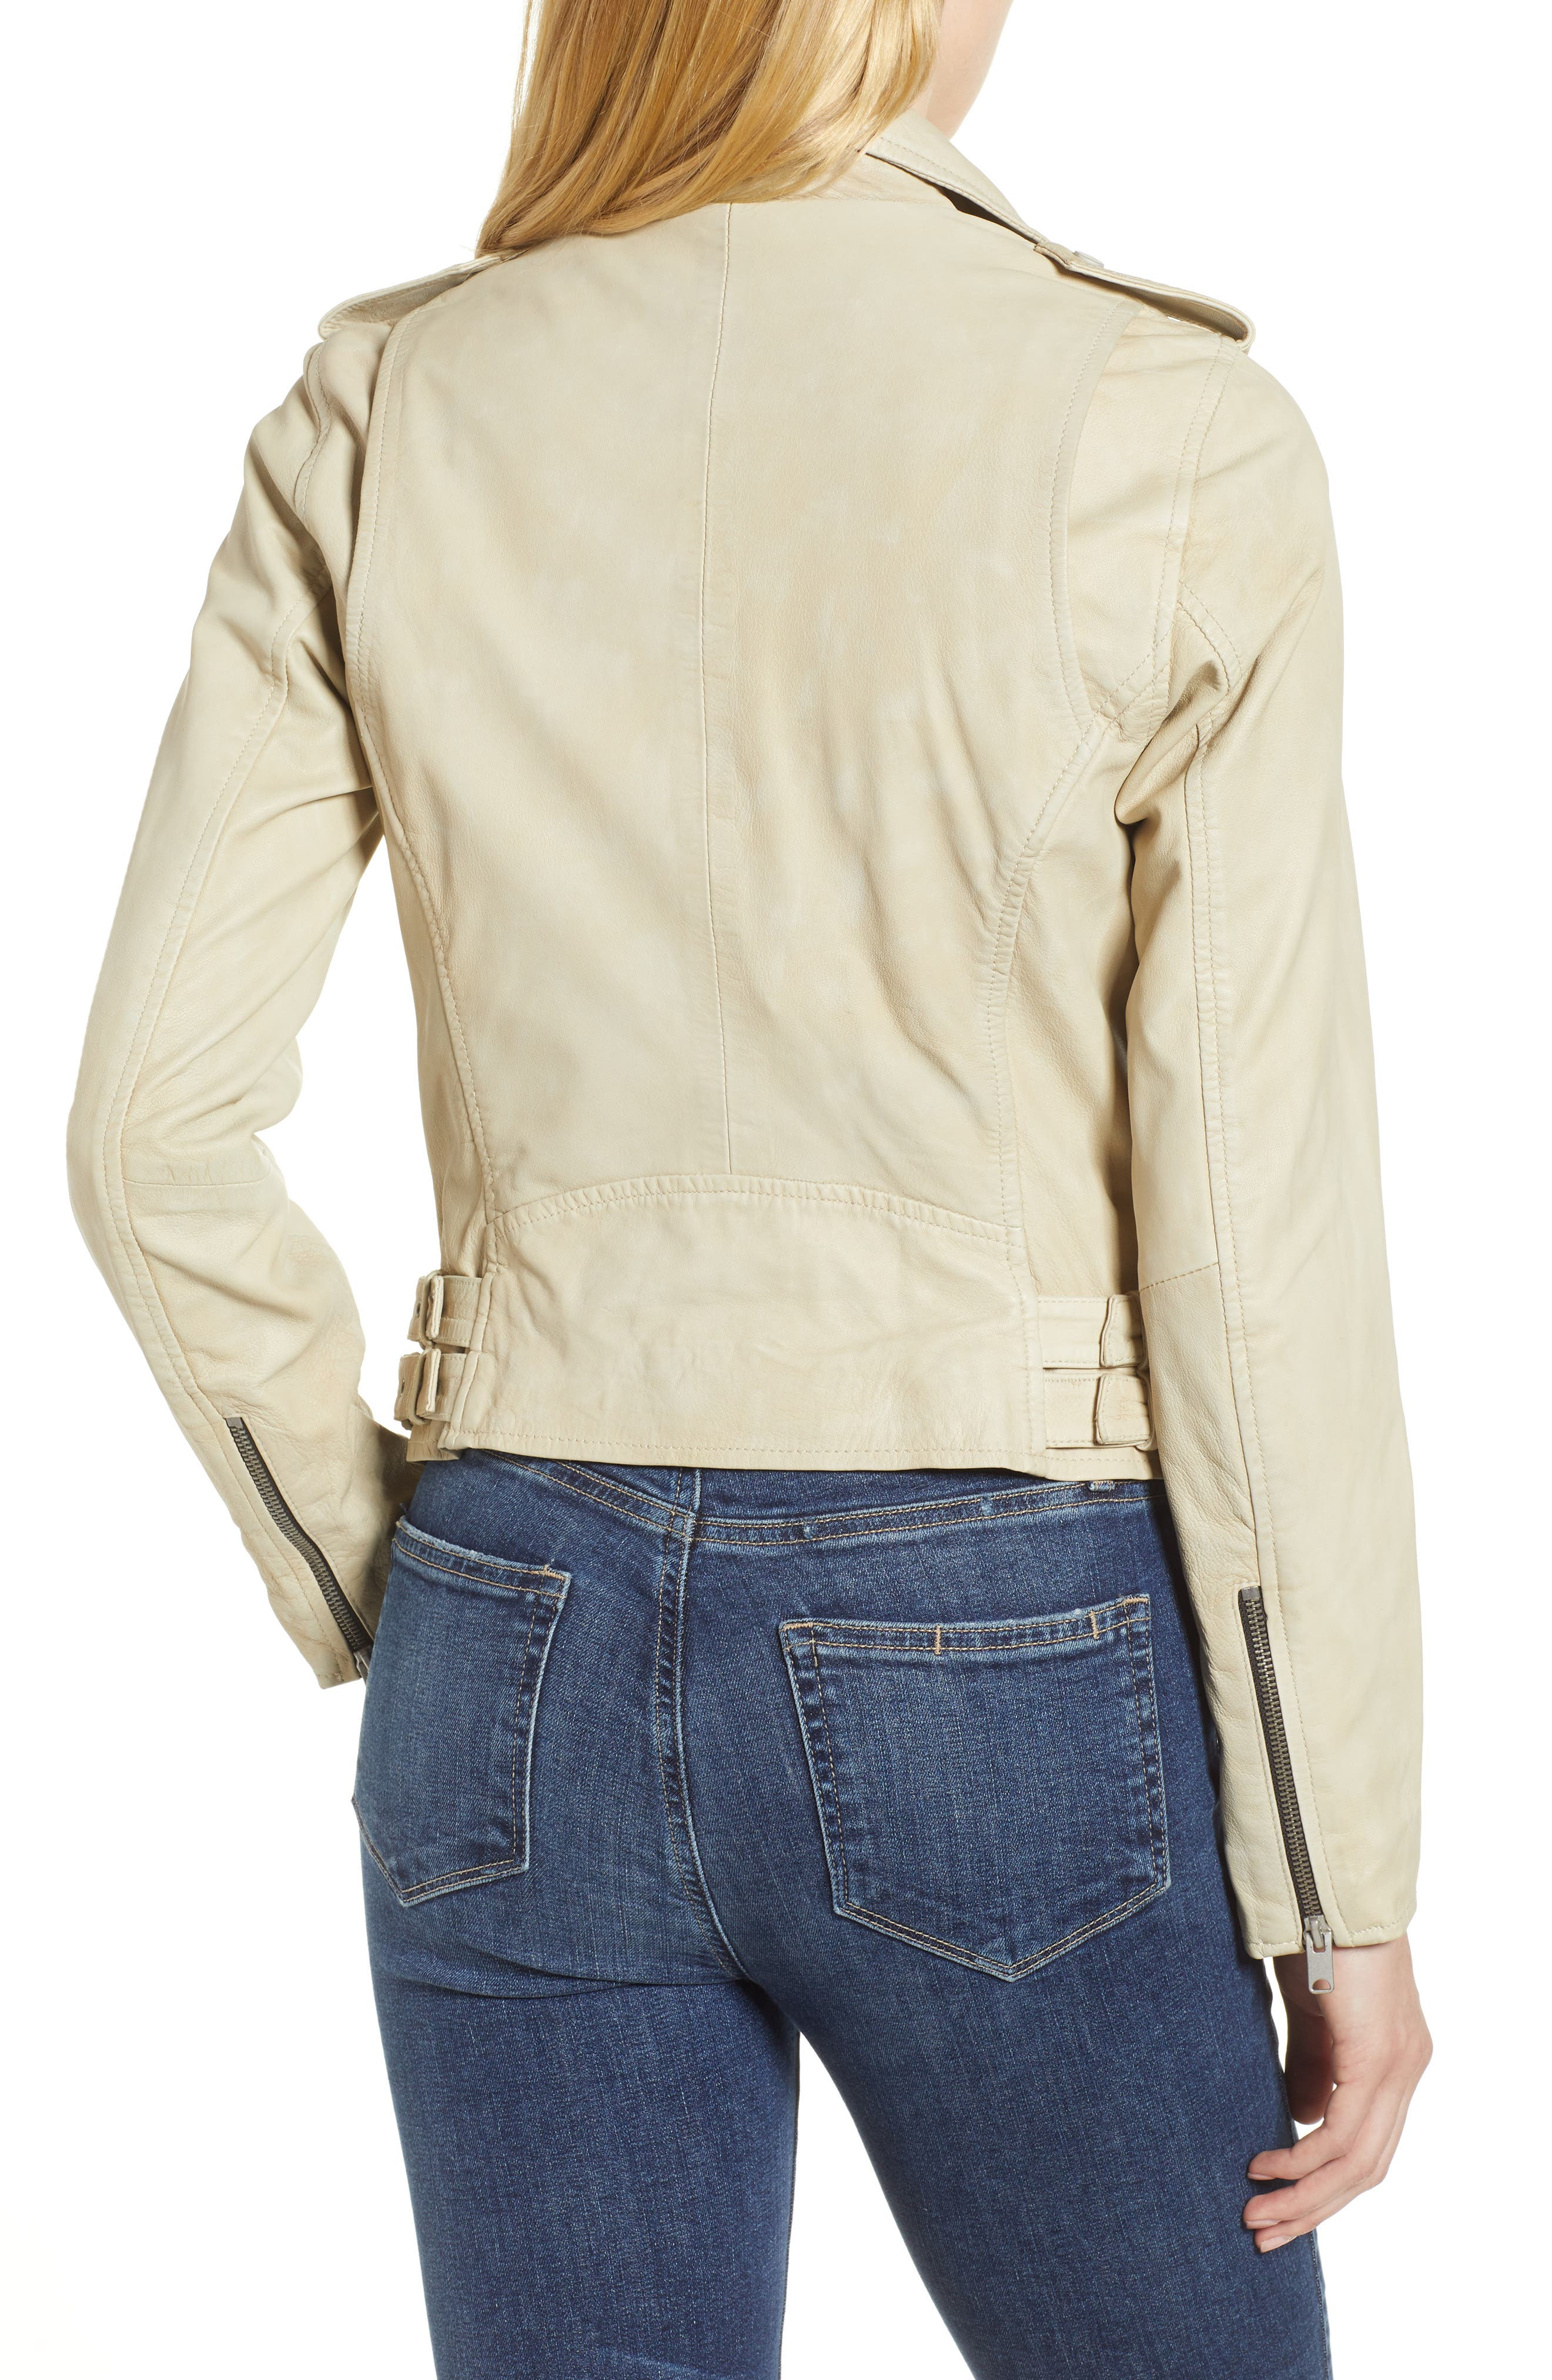 Whitney Washed Leather Crop Jacket,                             Alternate thumbnail 2, color,                             277